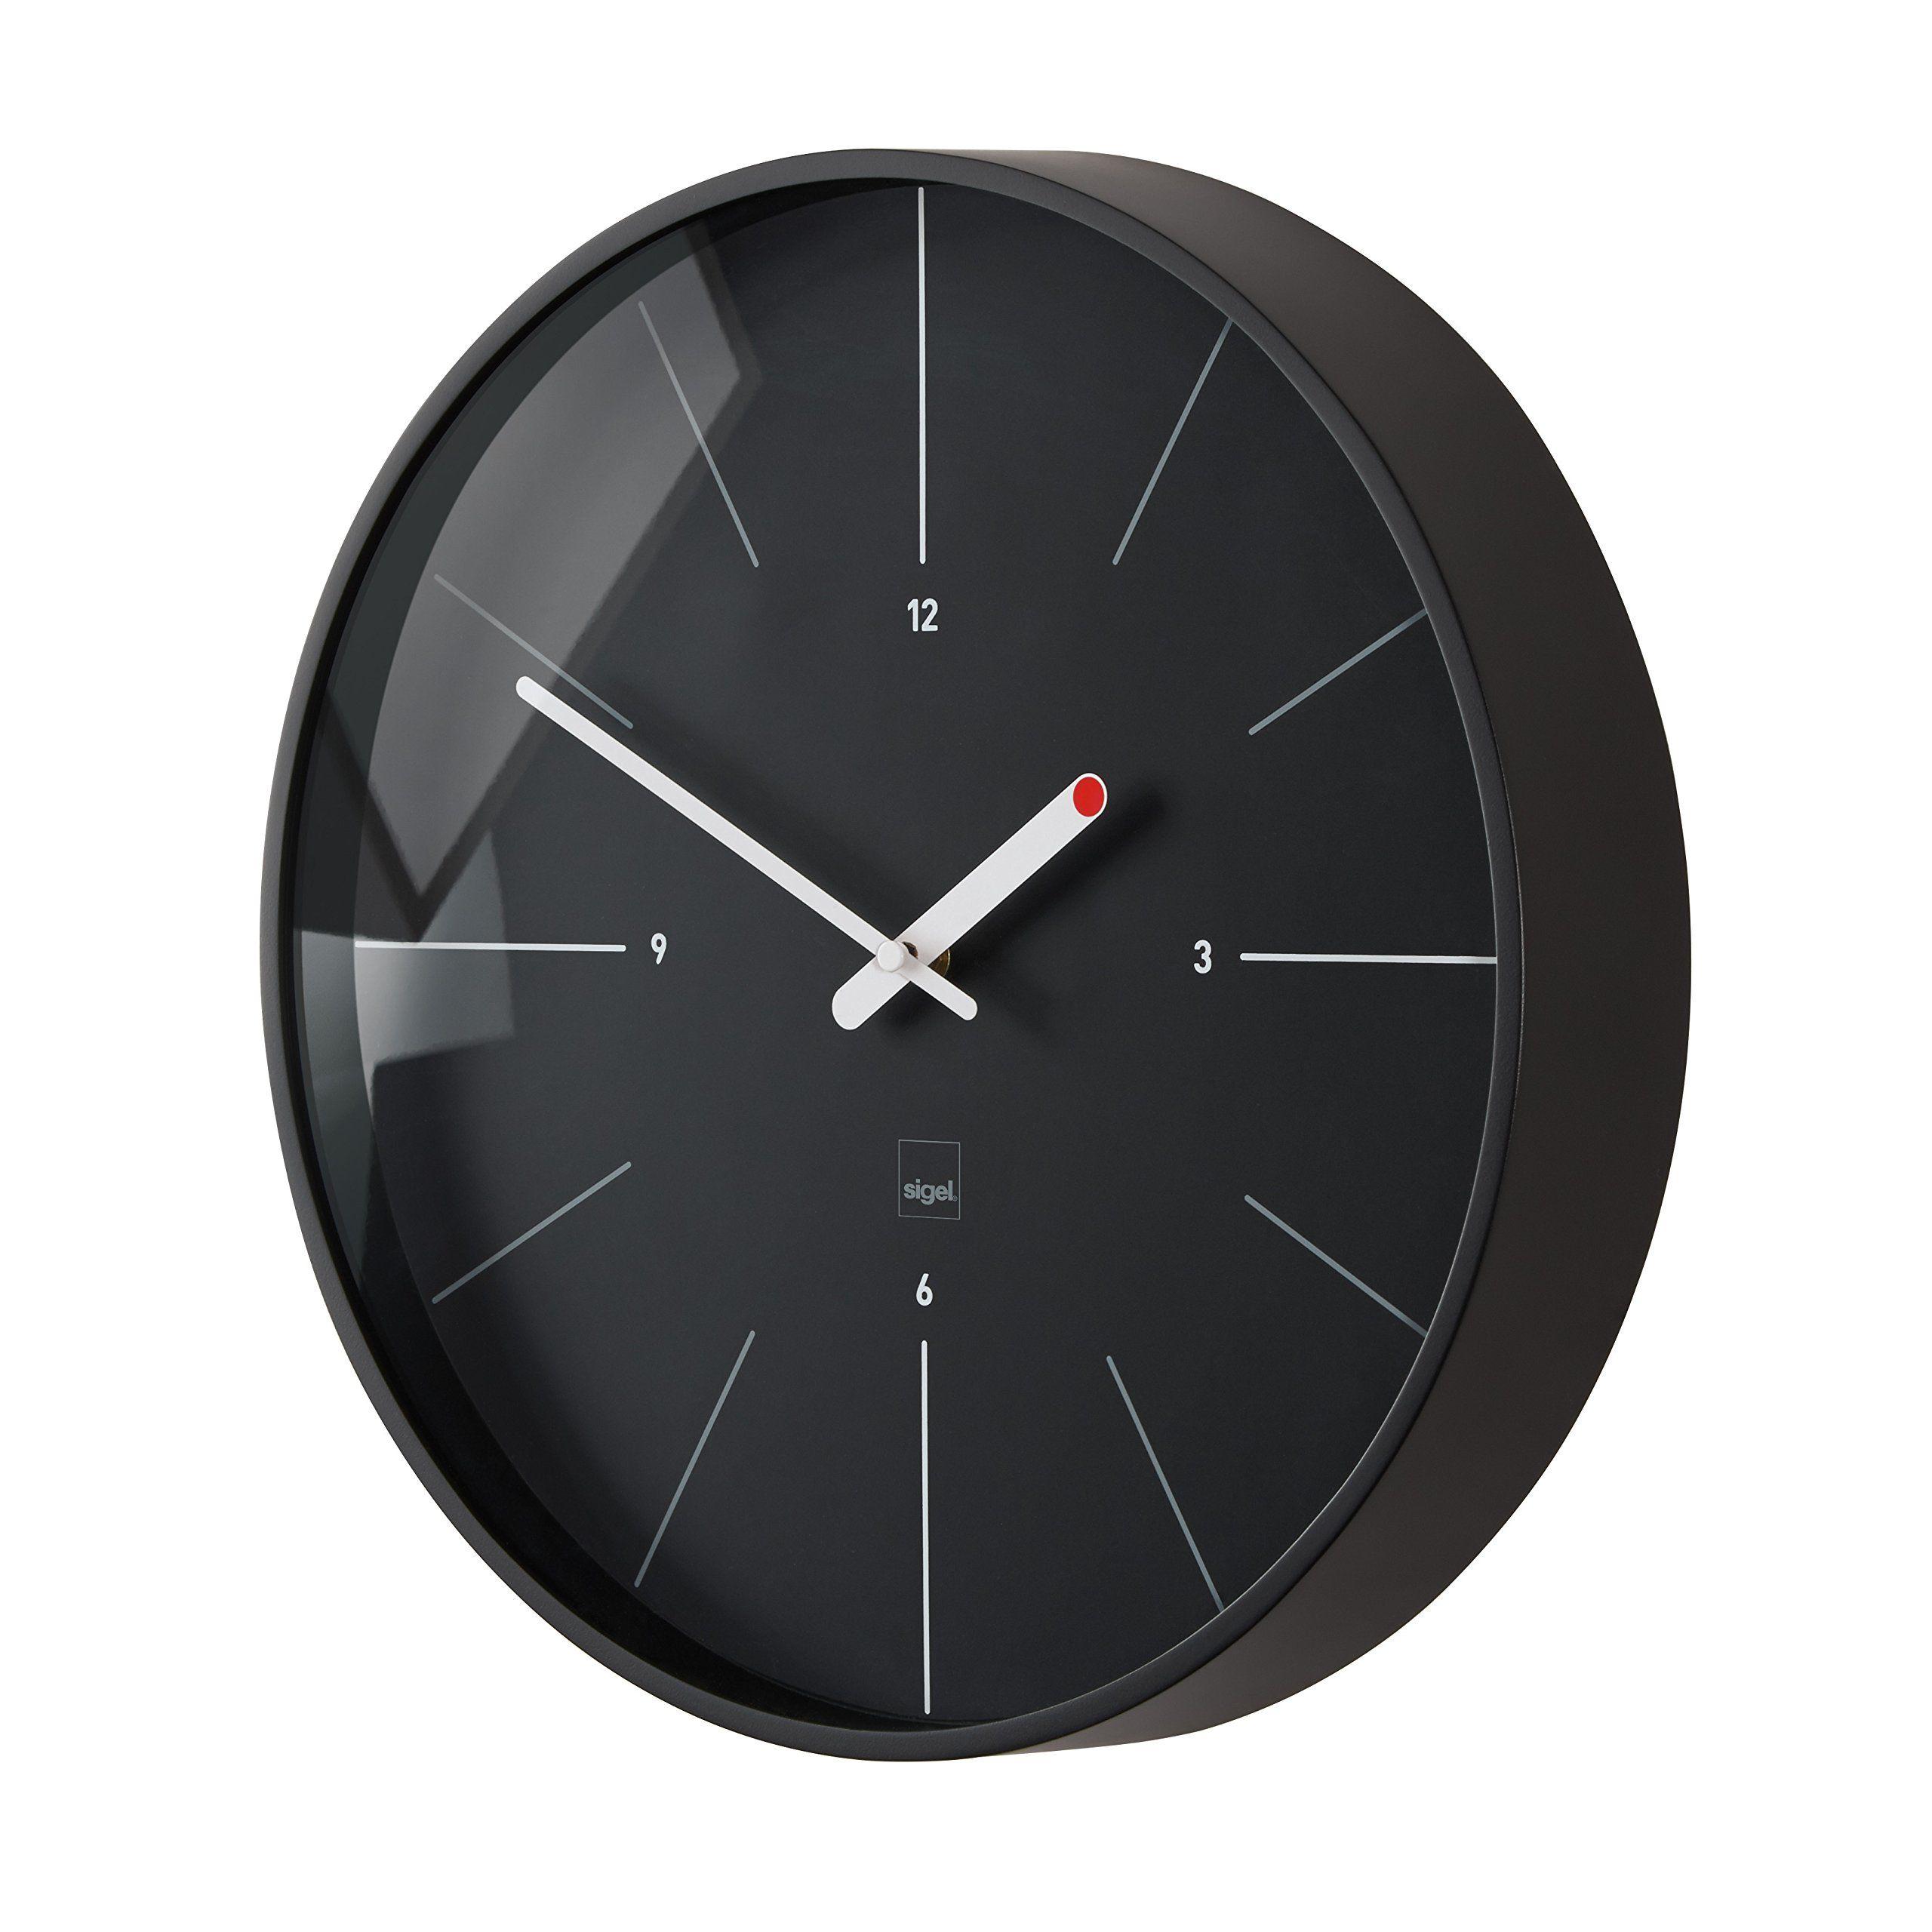 Sigel Wu113 Design Funk Wanduhr Modell Ondo Schwarz Ø 36 Cm Artetempus Reddot Design Award 2014 Gewinner Amazon De Küche Home Clock Clock Clock Design